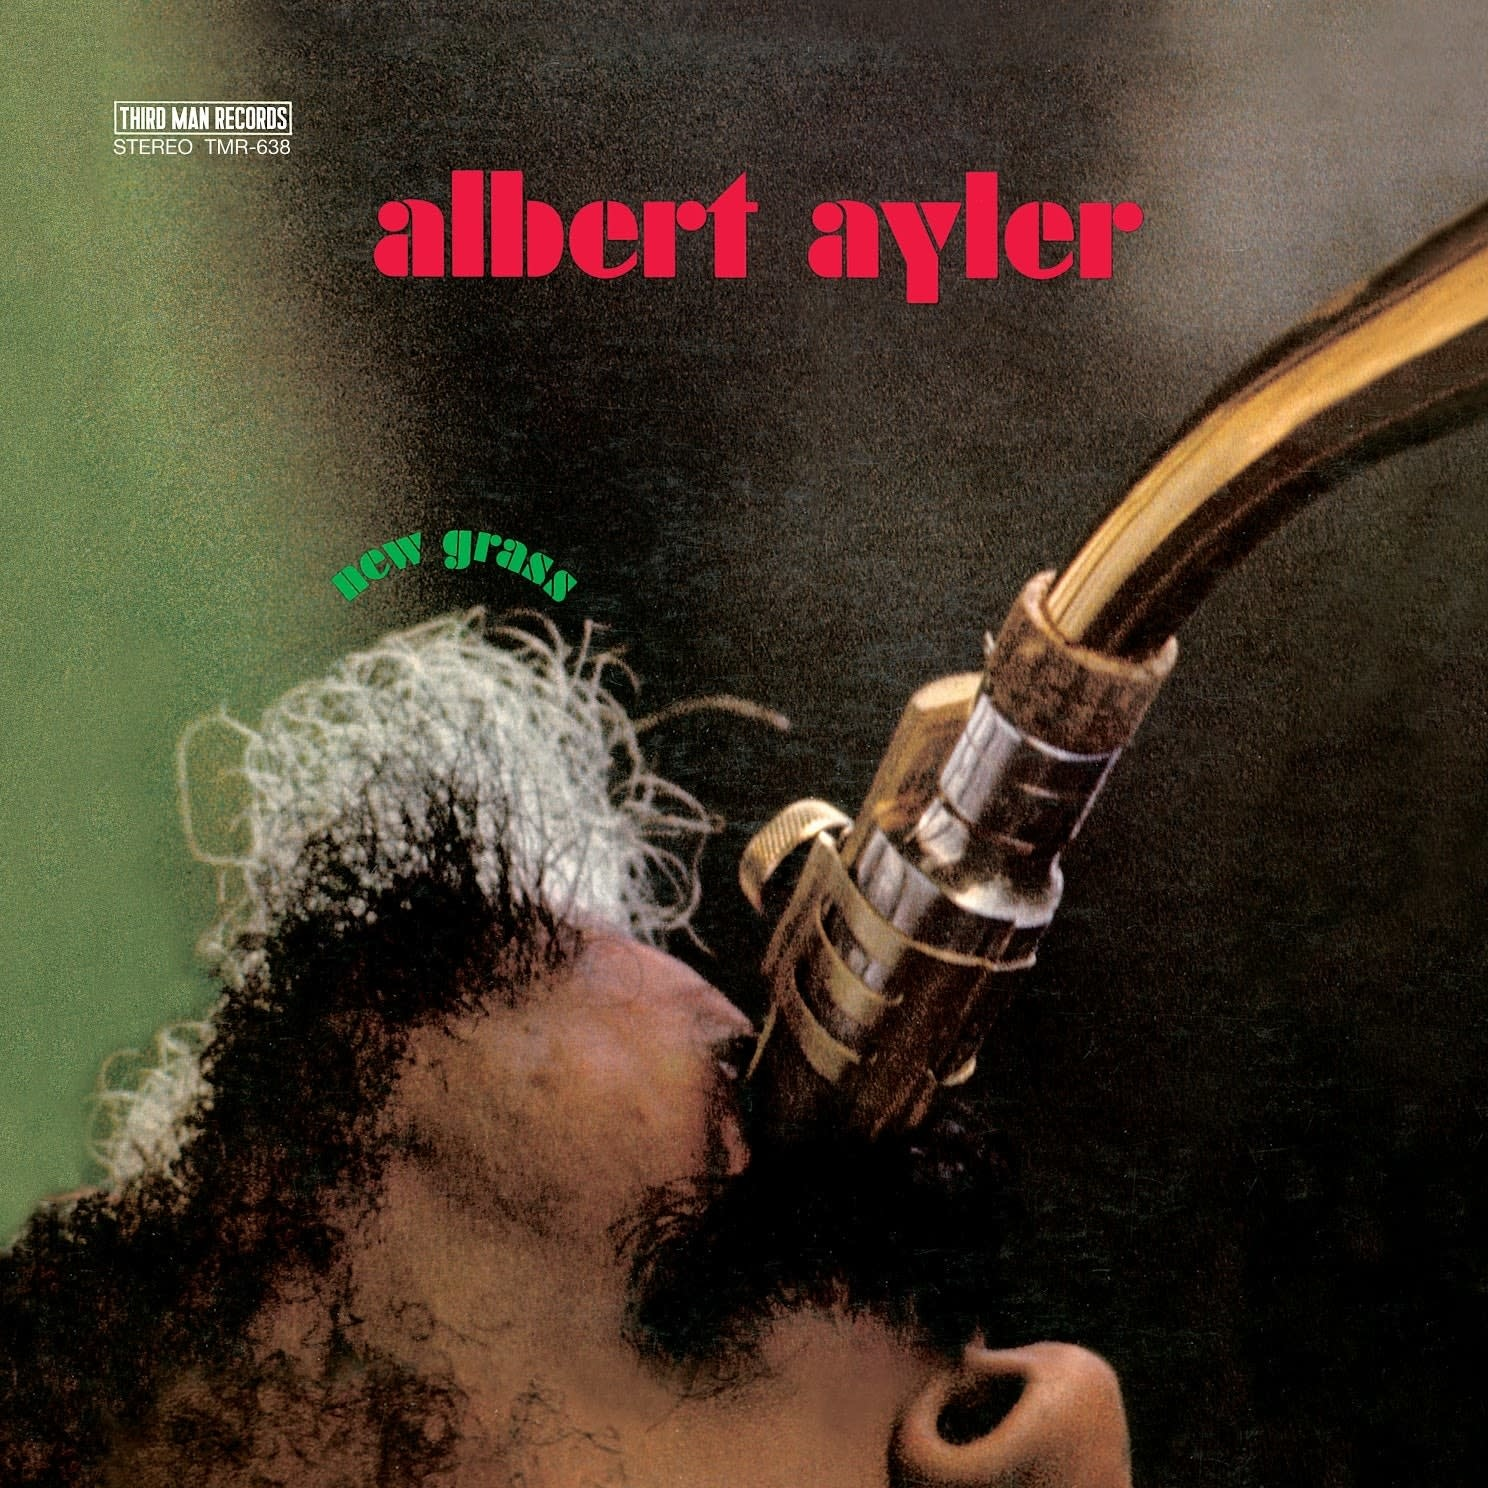 Third Man Records Albert Ayler - New Grass (Coloured Vinyl)